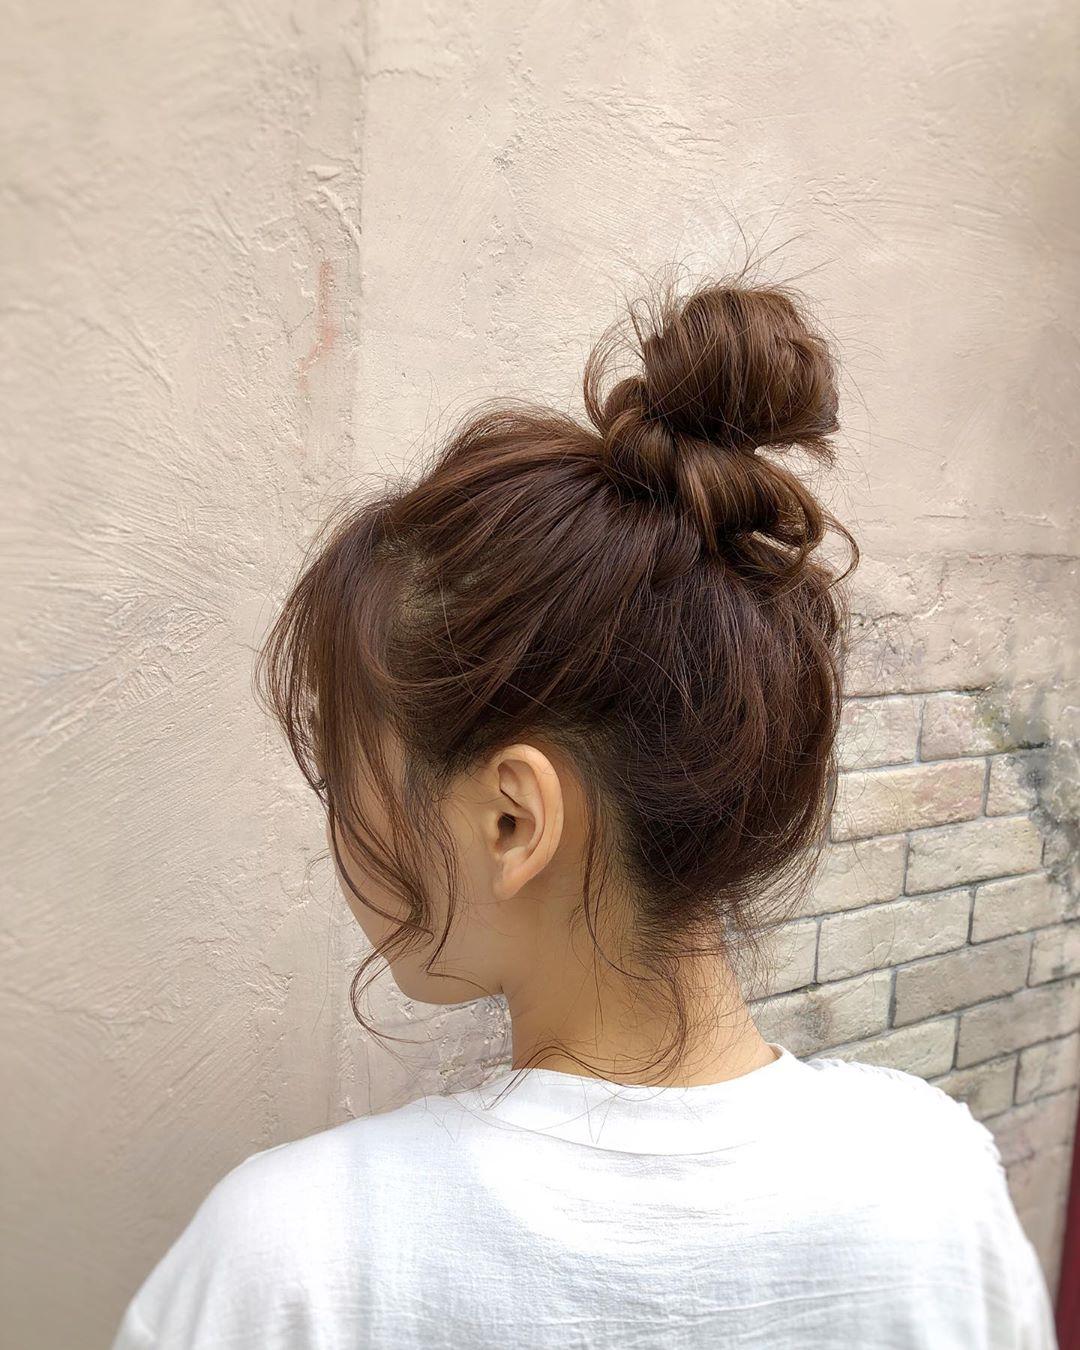 Habits for Hair Loss - Bun